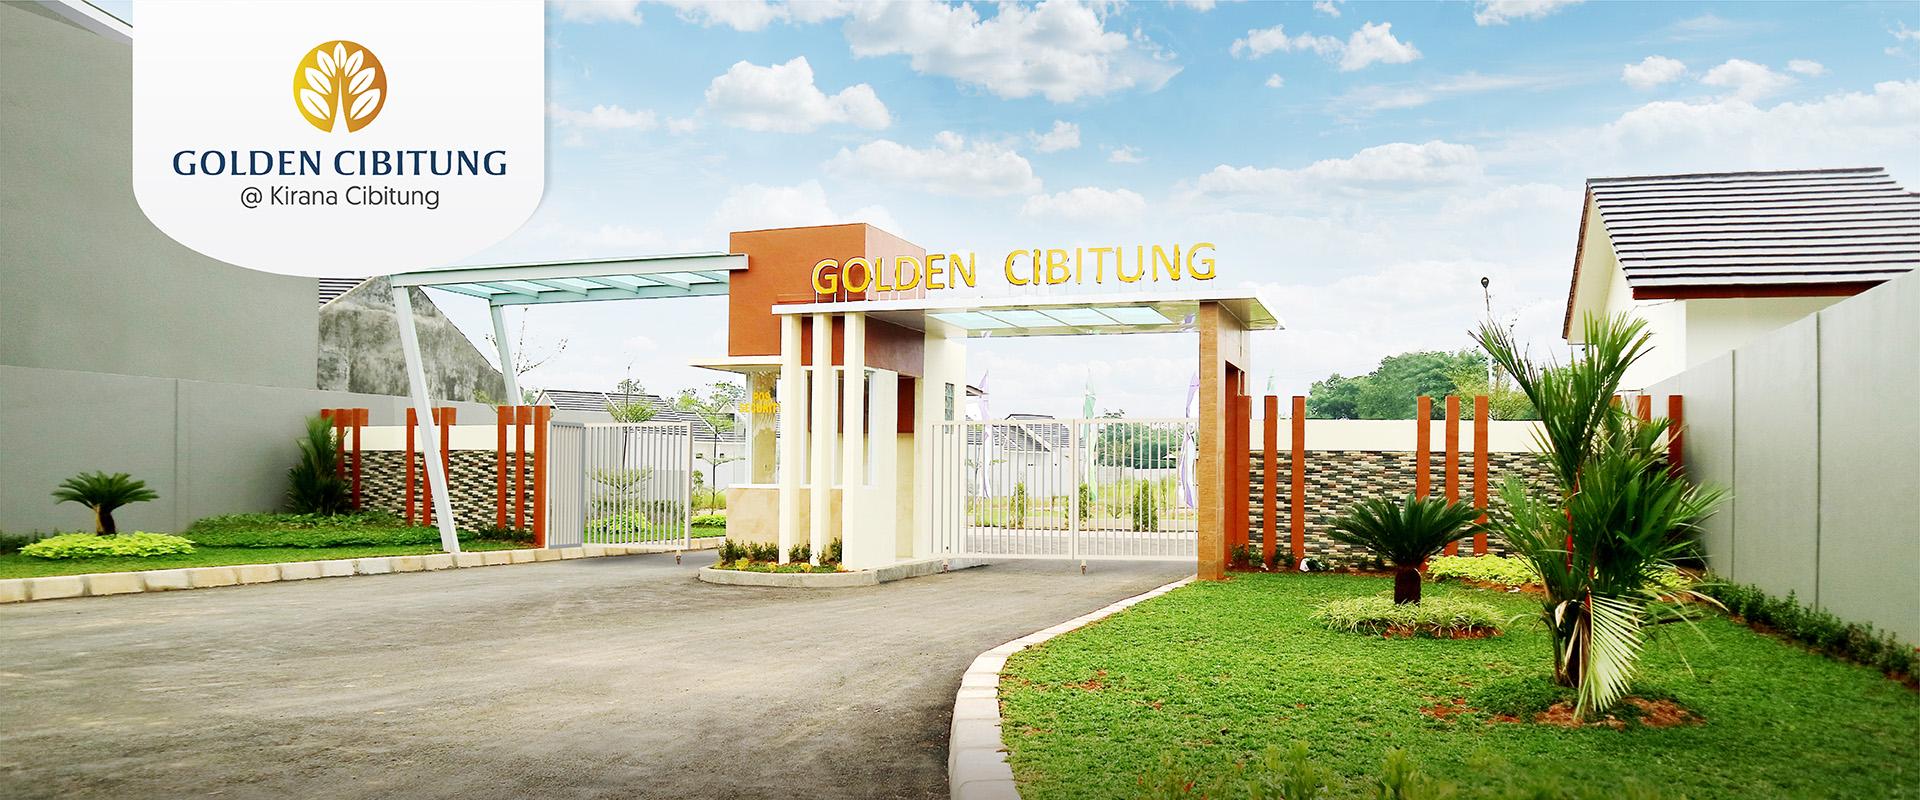 Golden Cibitung